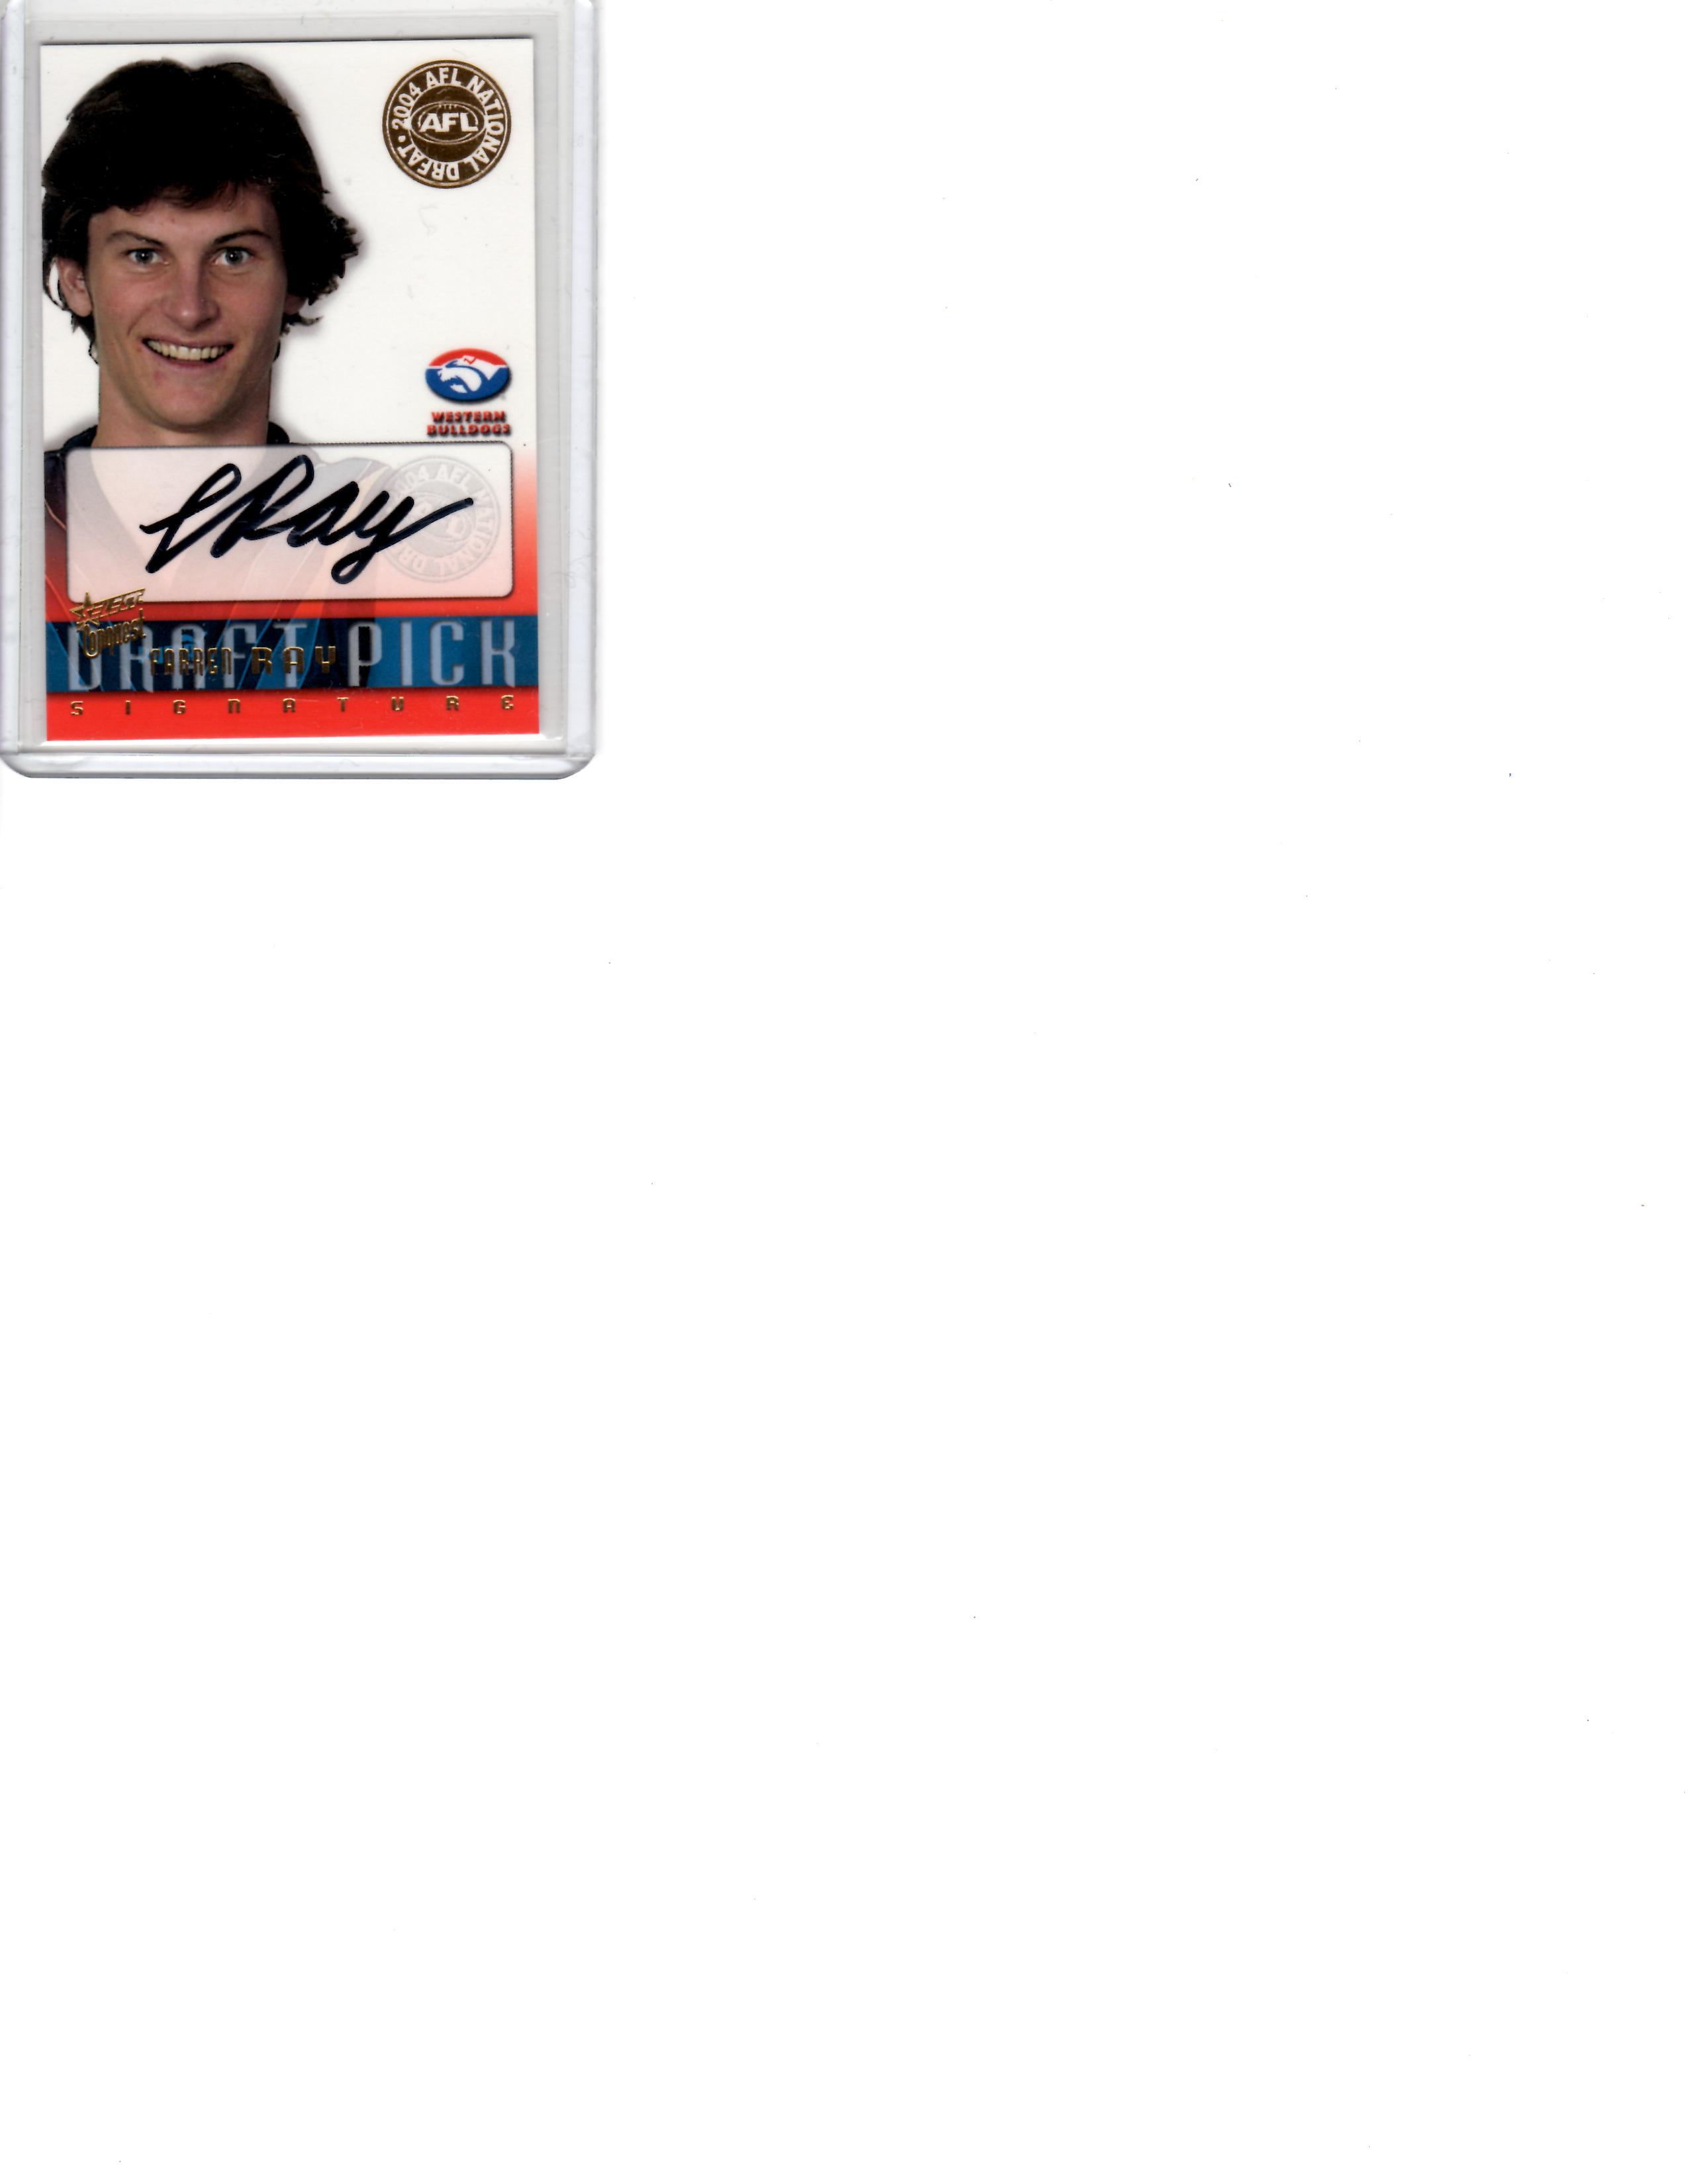 Farren Ray AFL 04 Draft Pick signed